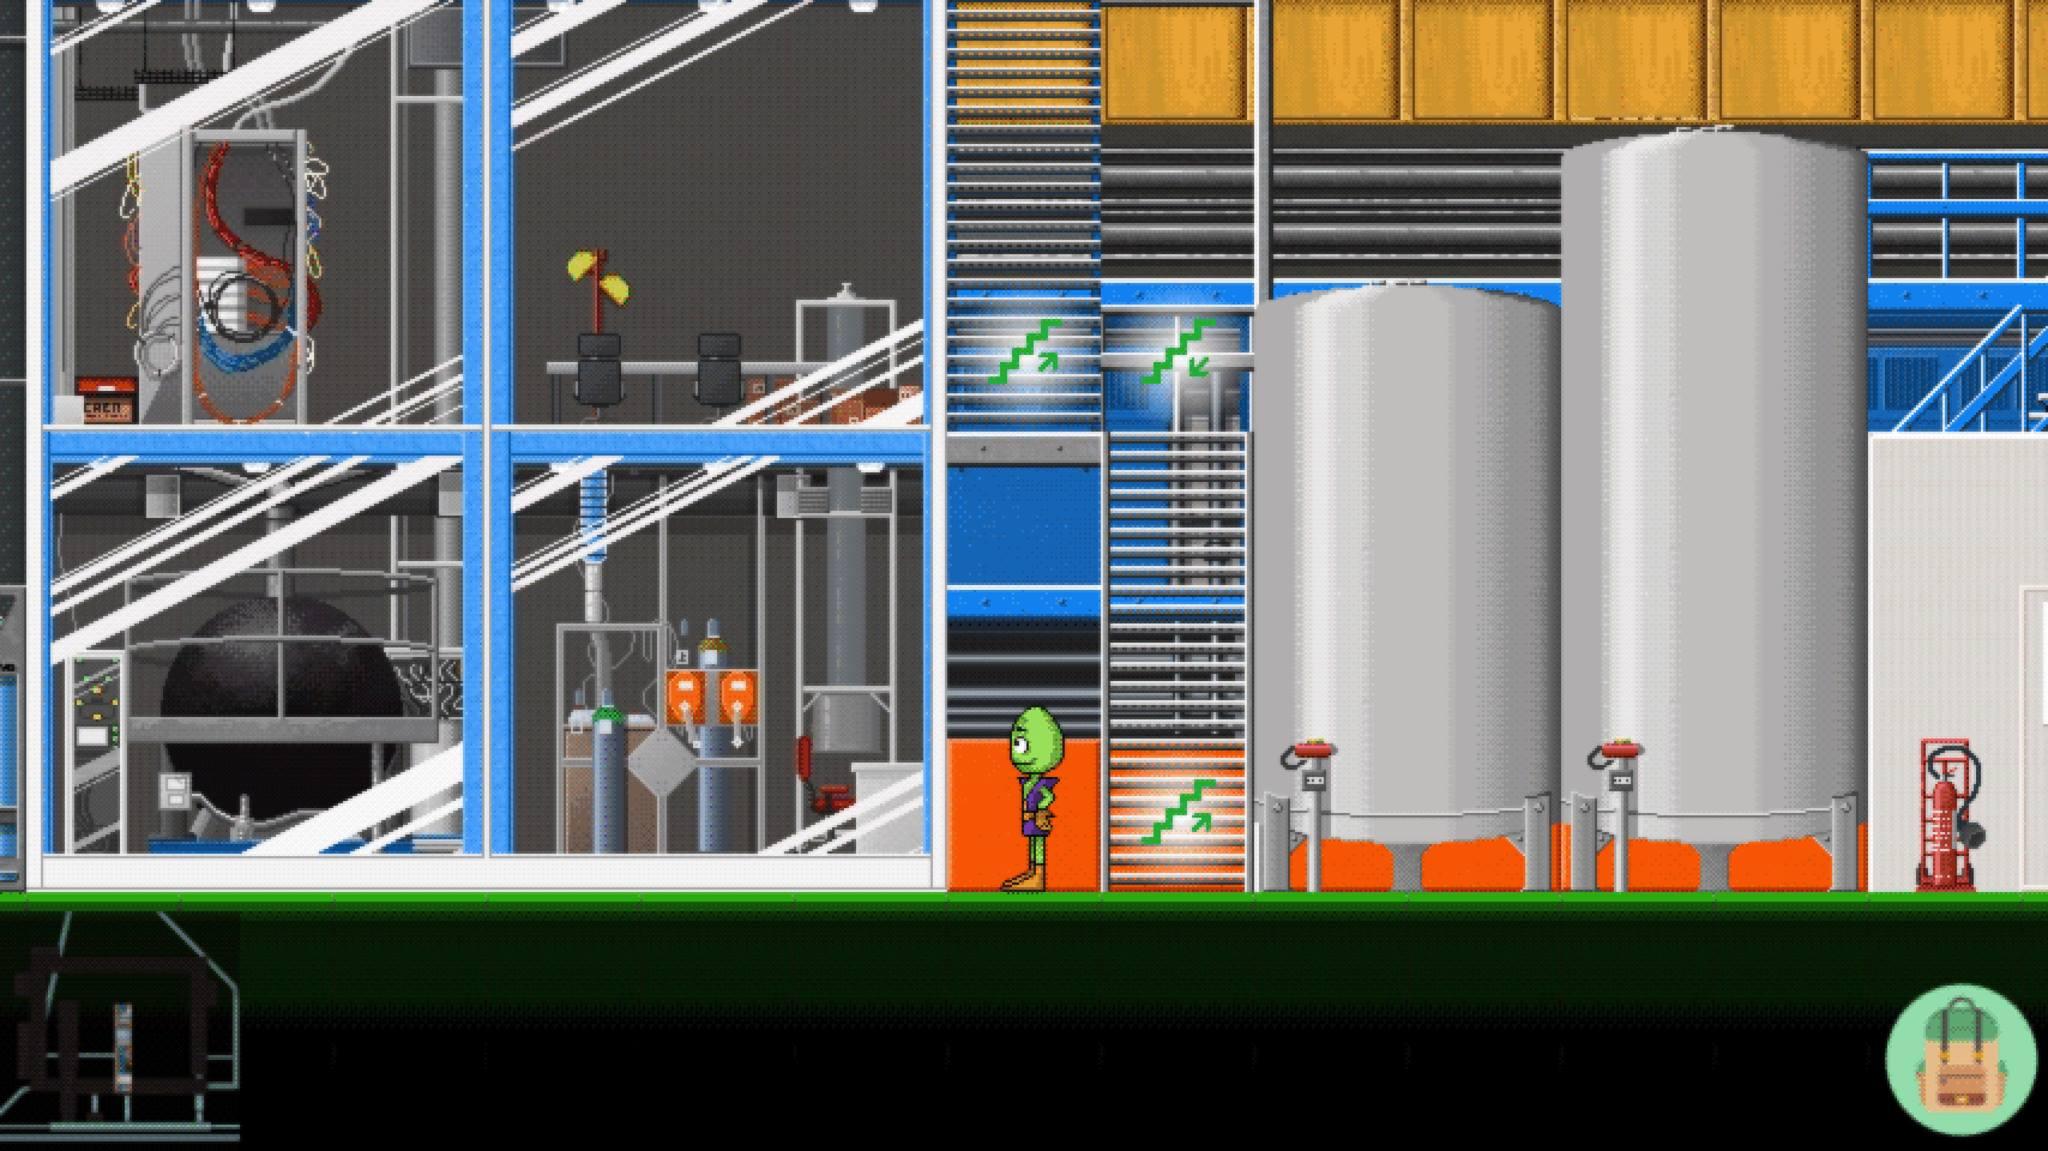 gran-sasso-videogame-01